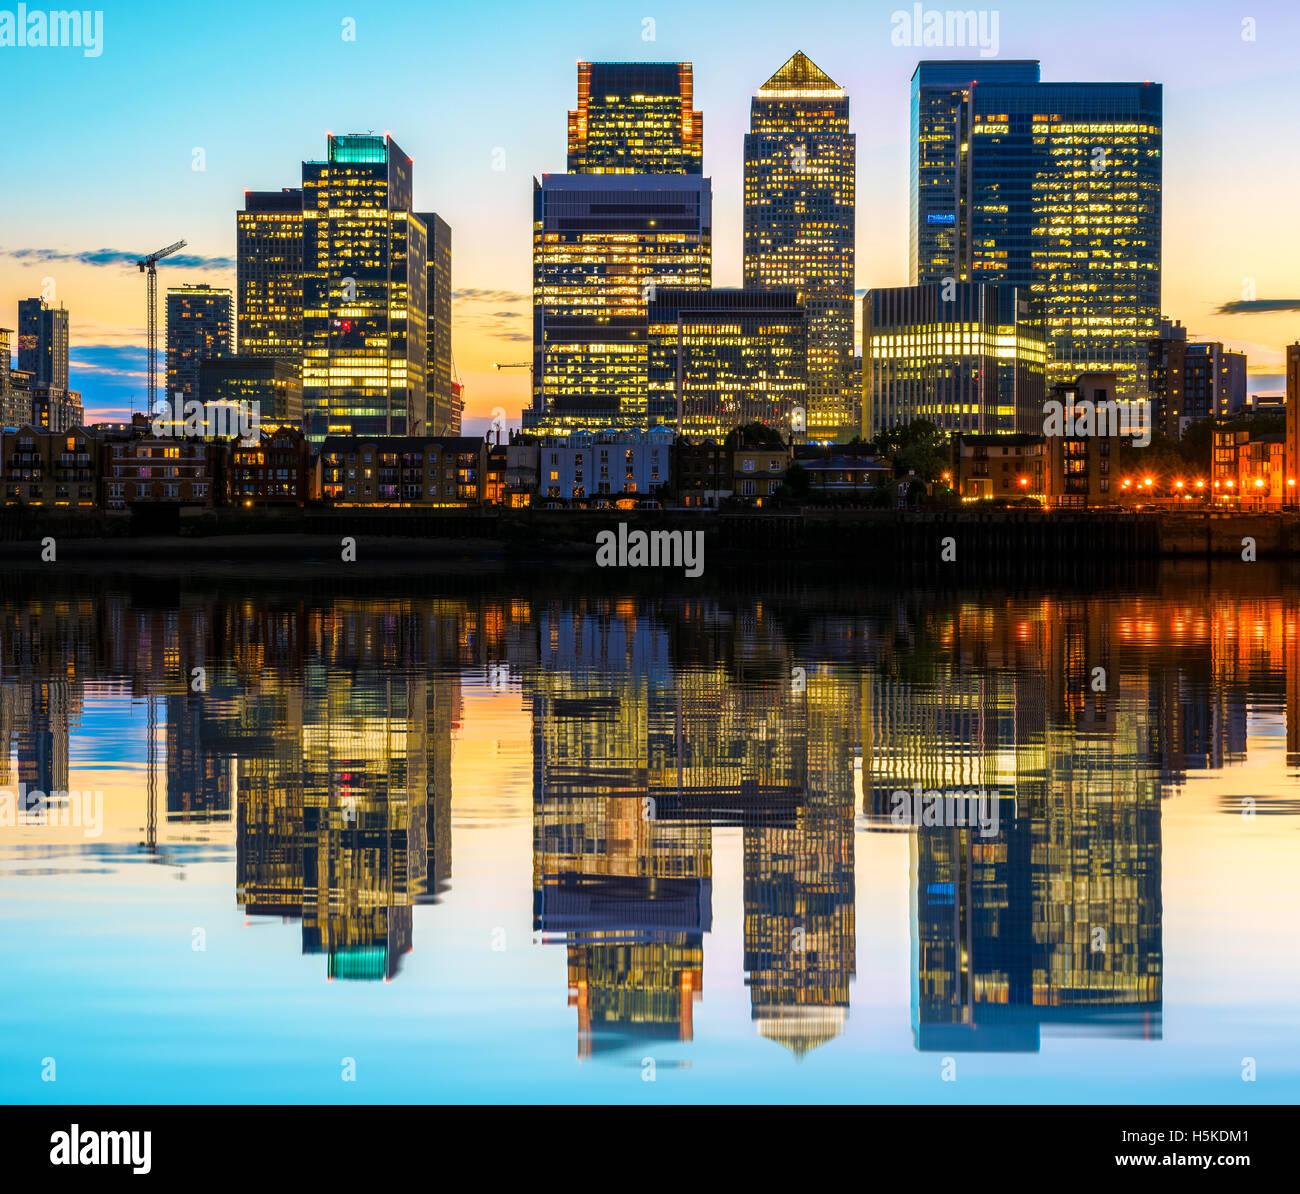 Beleuchtete Canary Wharf, Finanzzentrum in London bei Sonnenuntergang Stockbild